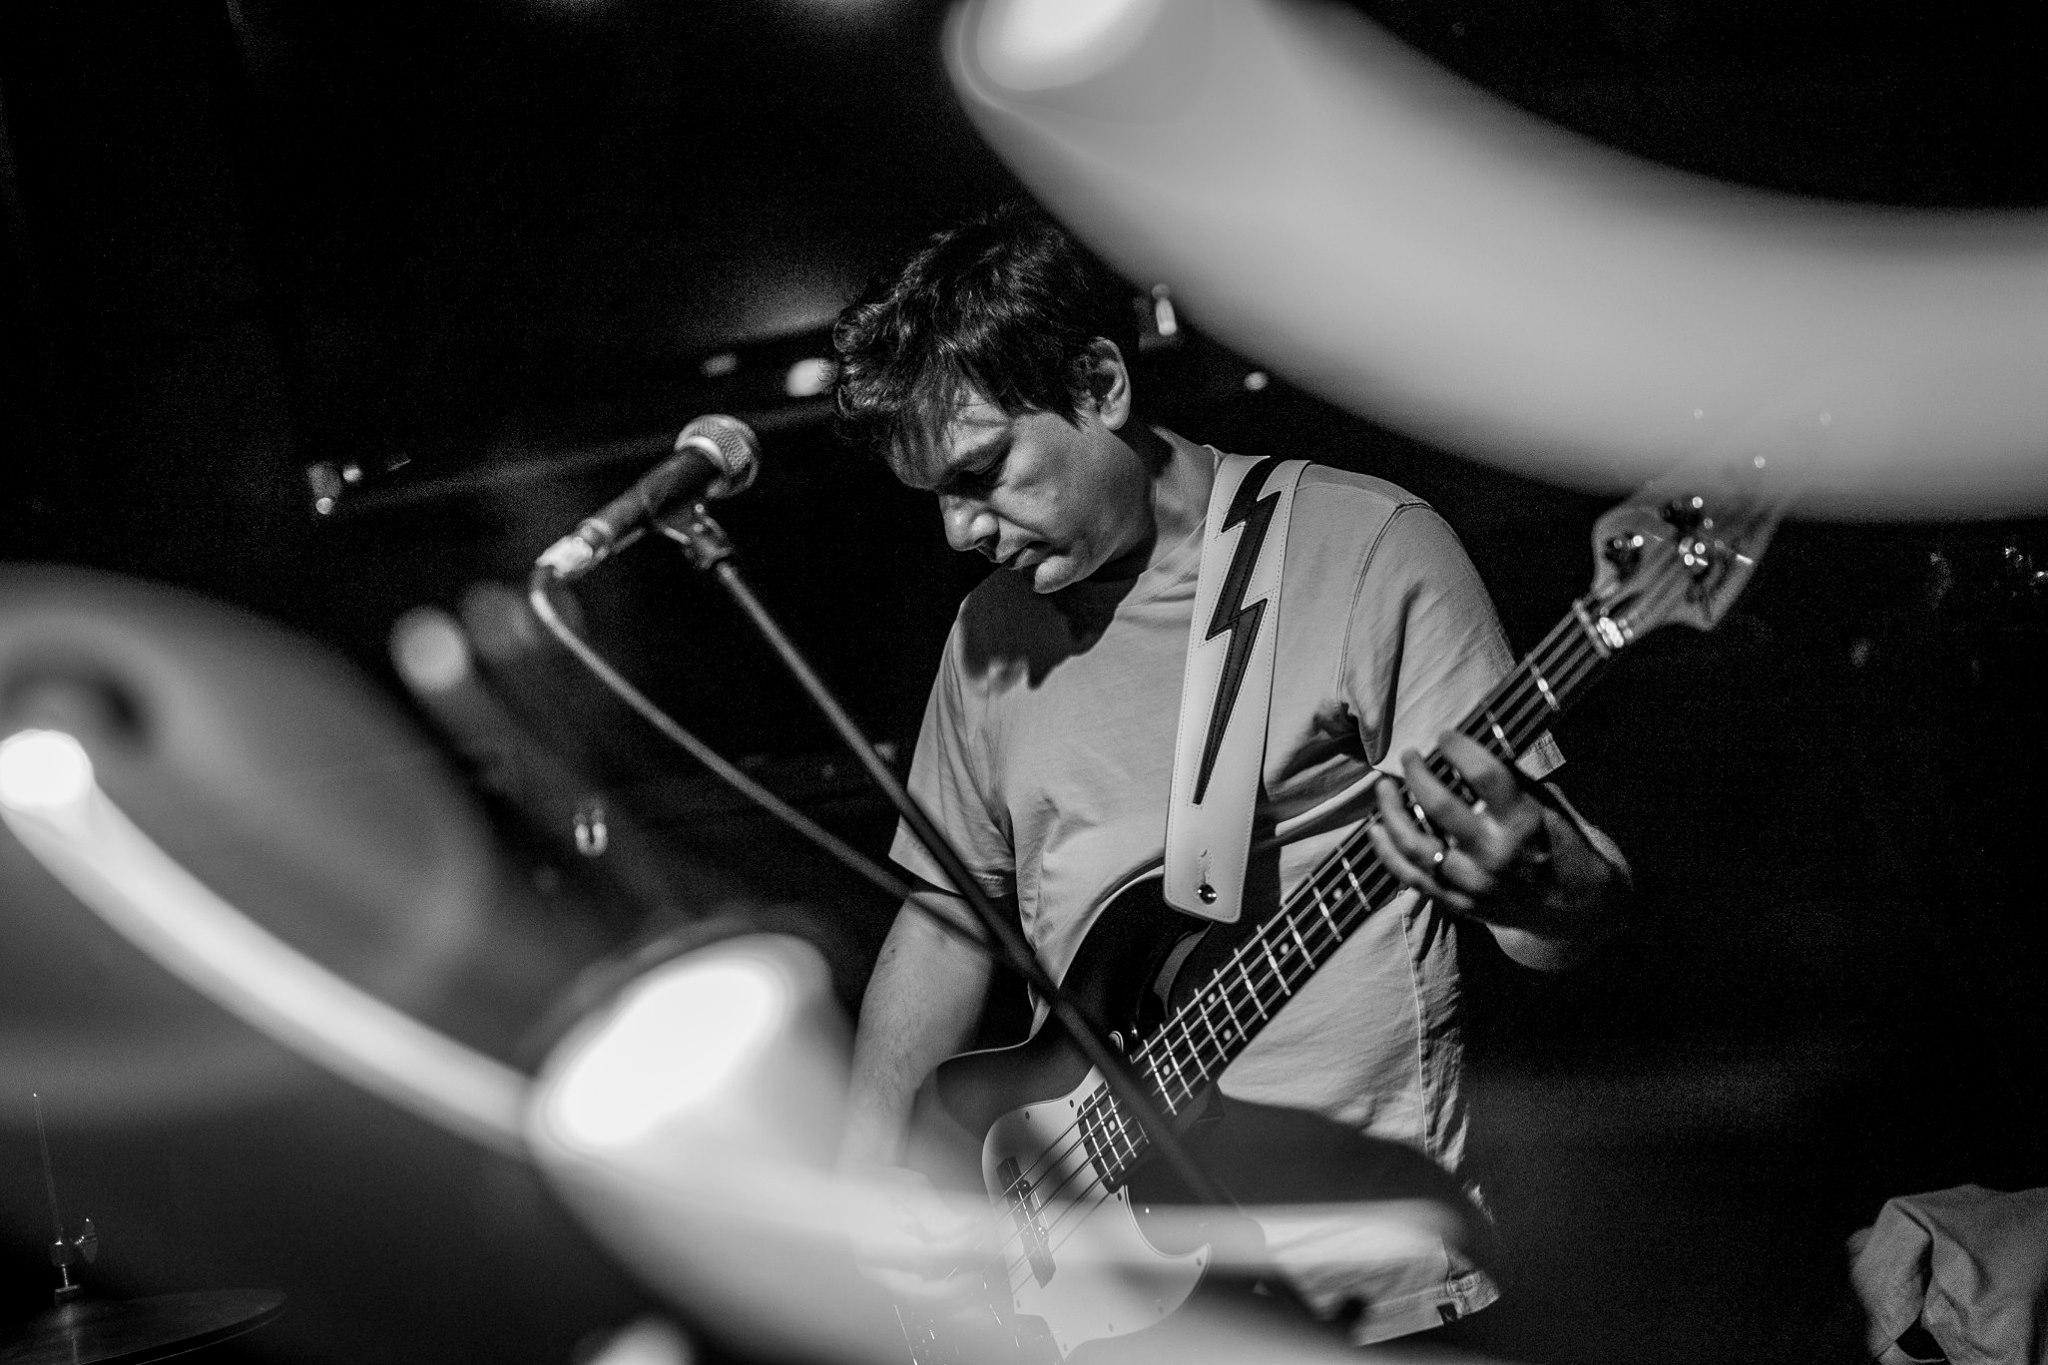 Photo by Joey Wharton